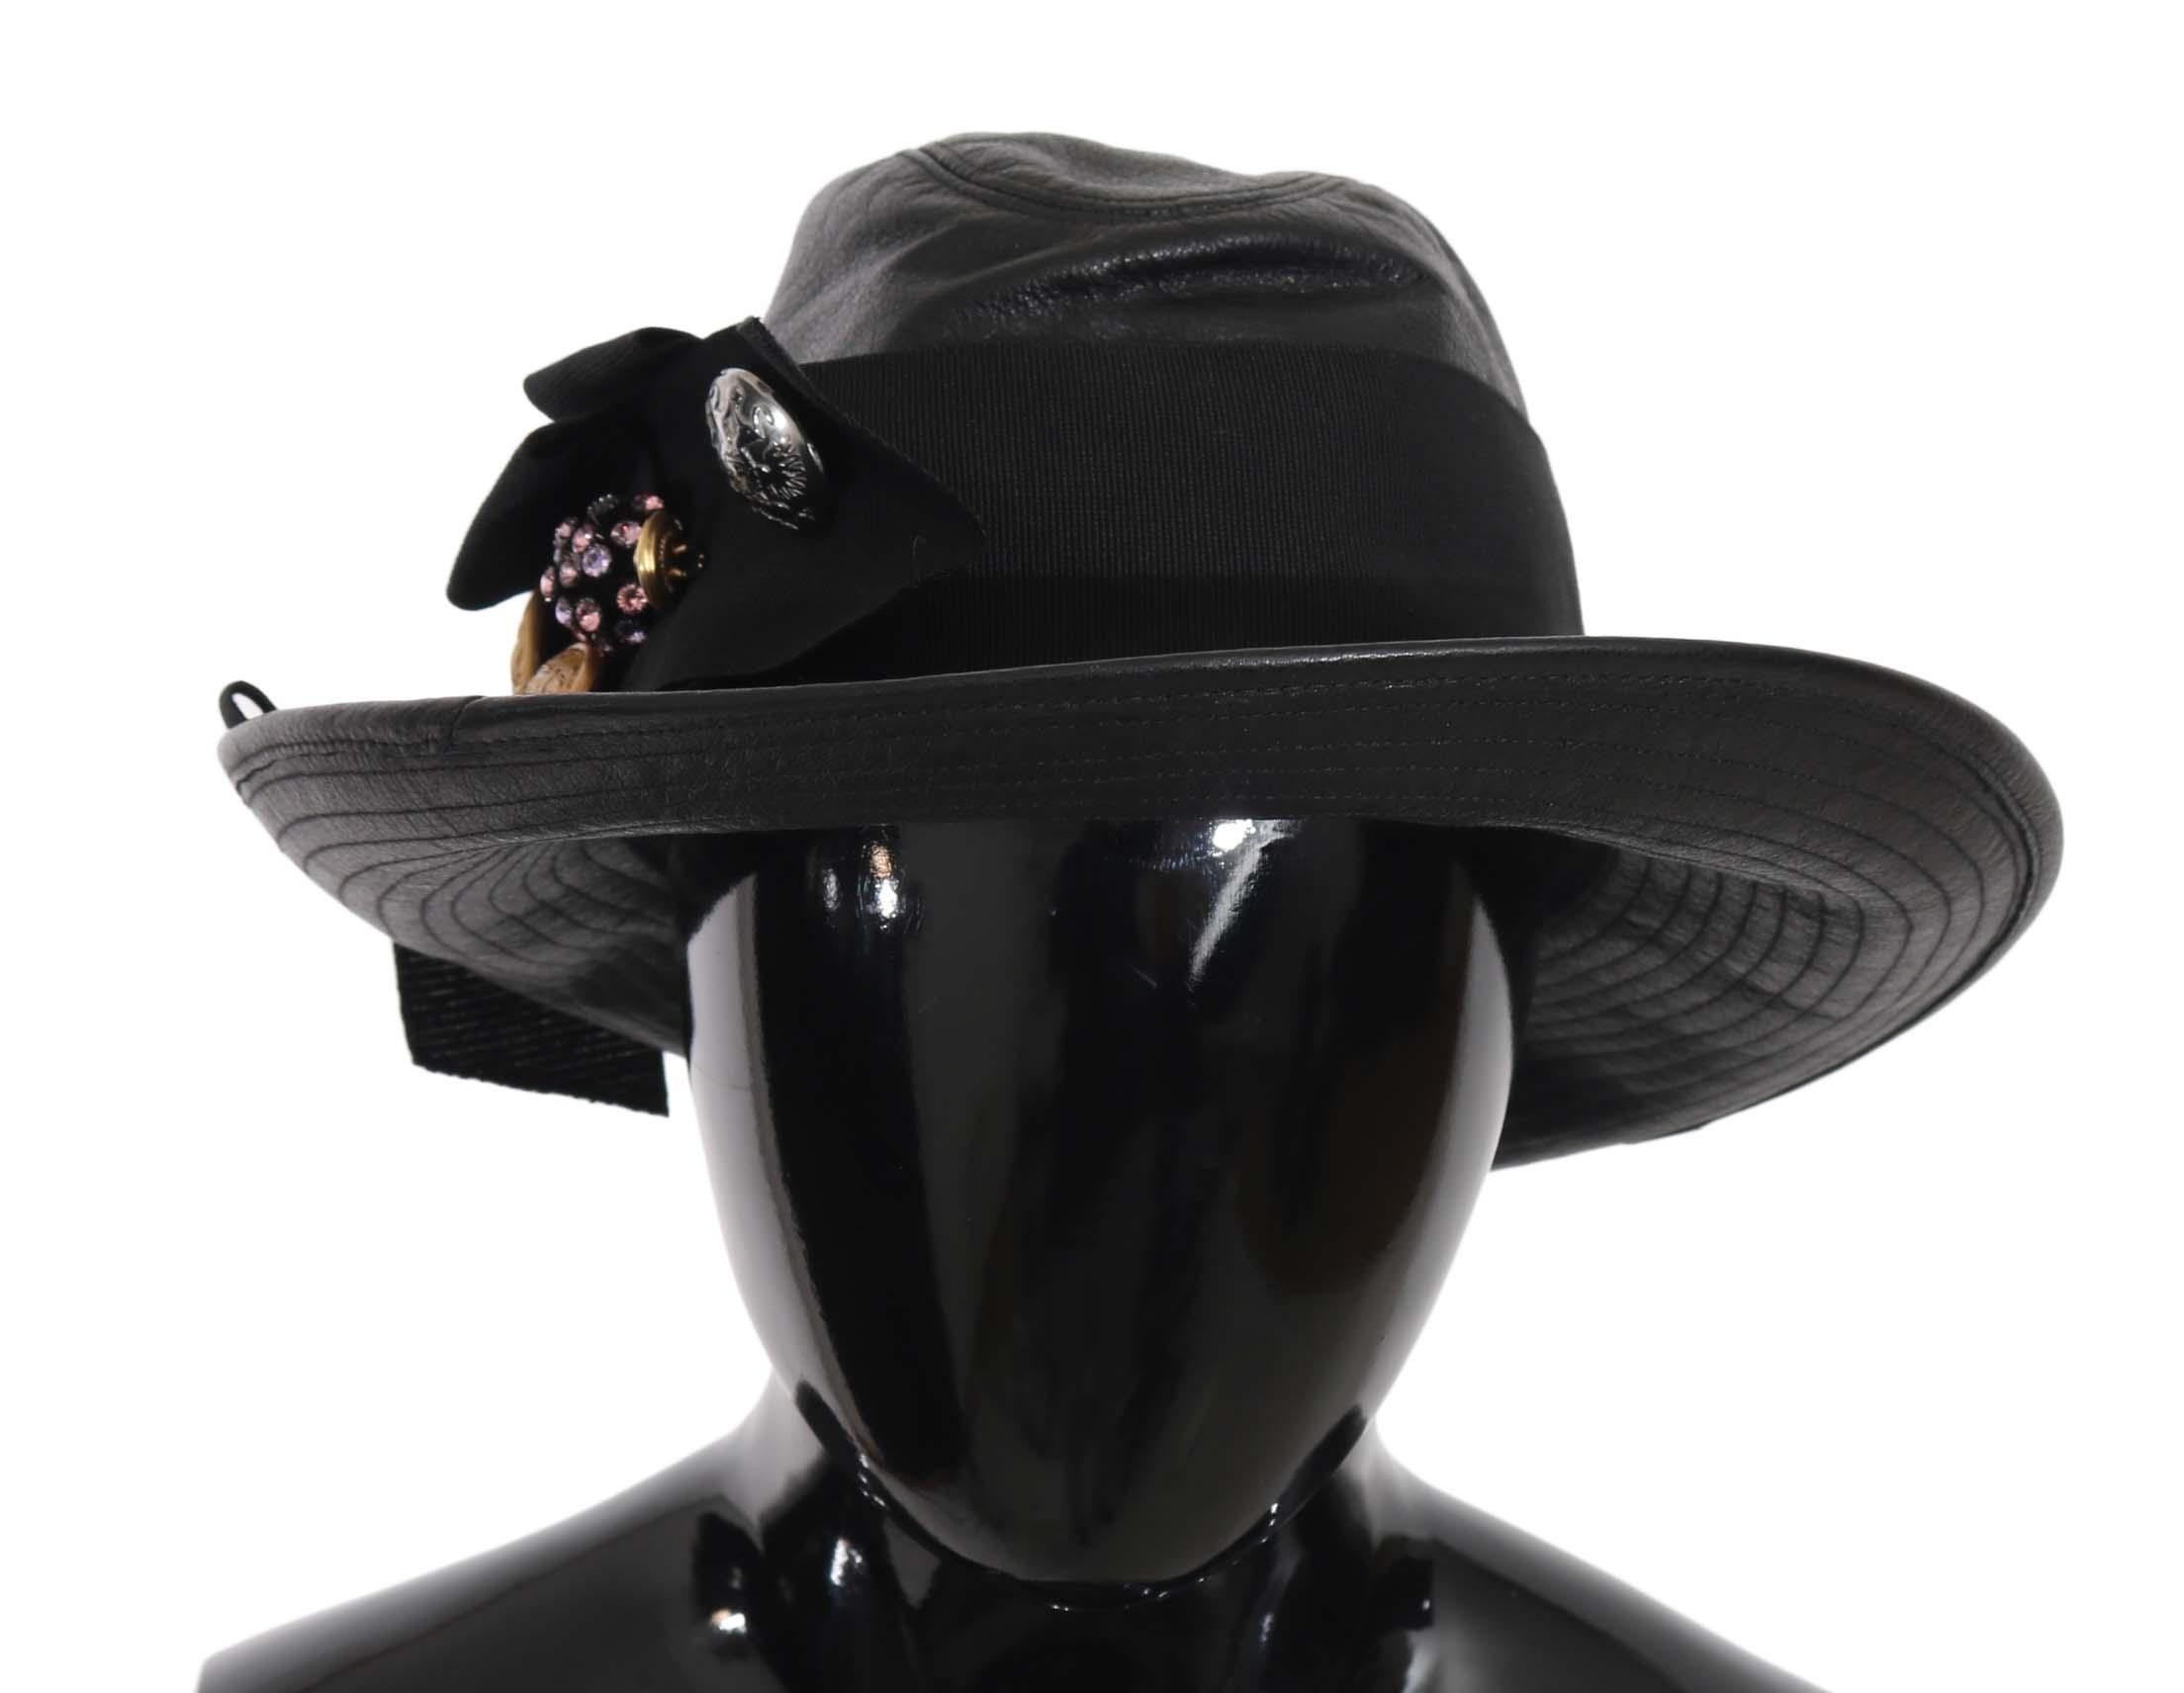 Dolce & Gabbana Women's Leather Wide Brim Crystal Hat Black HAT70130